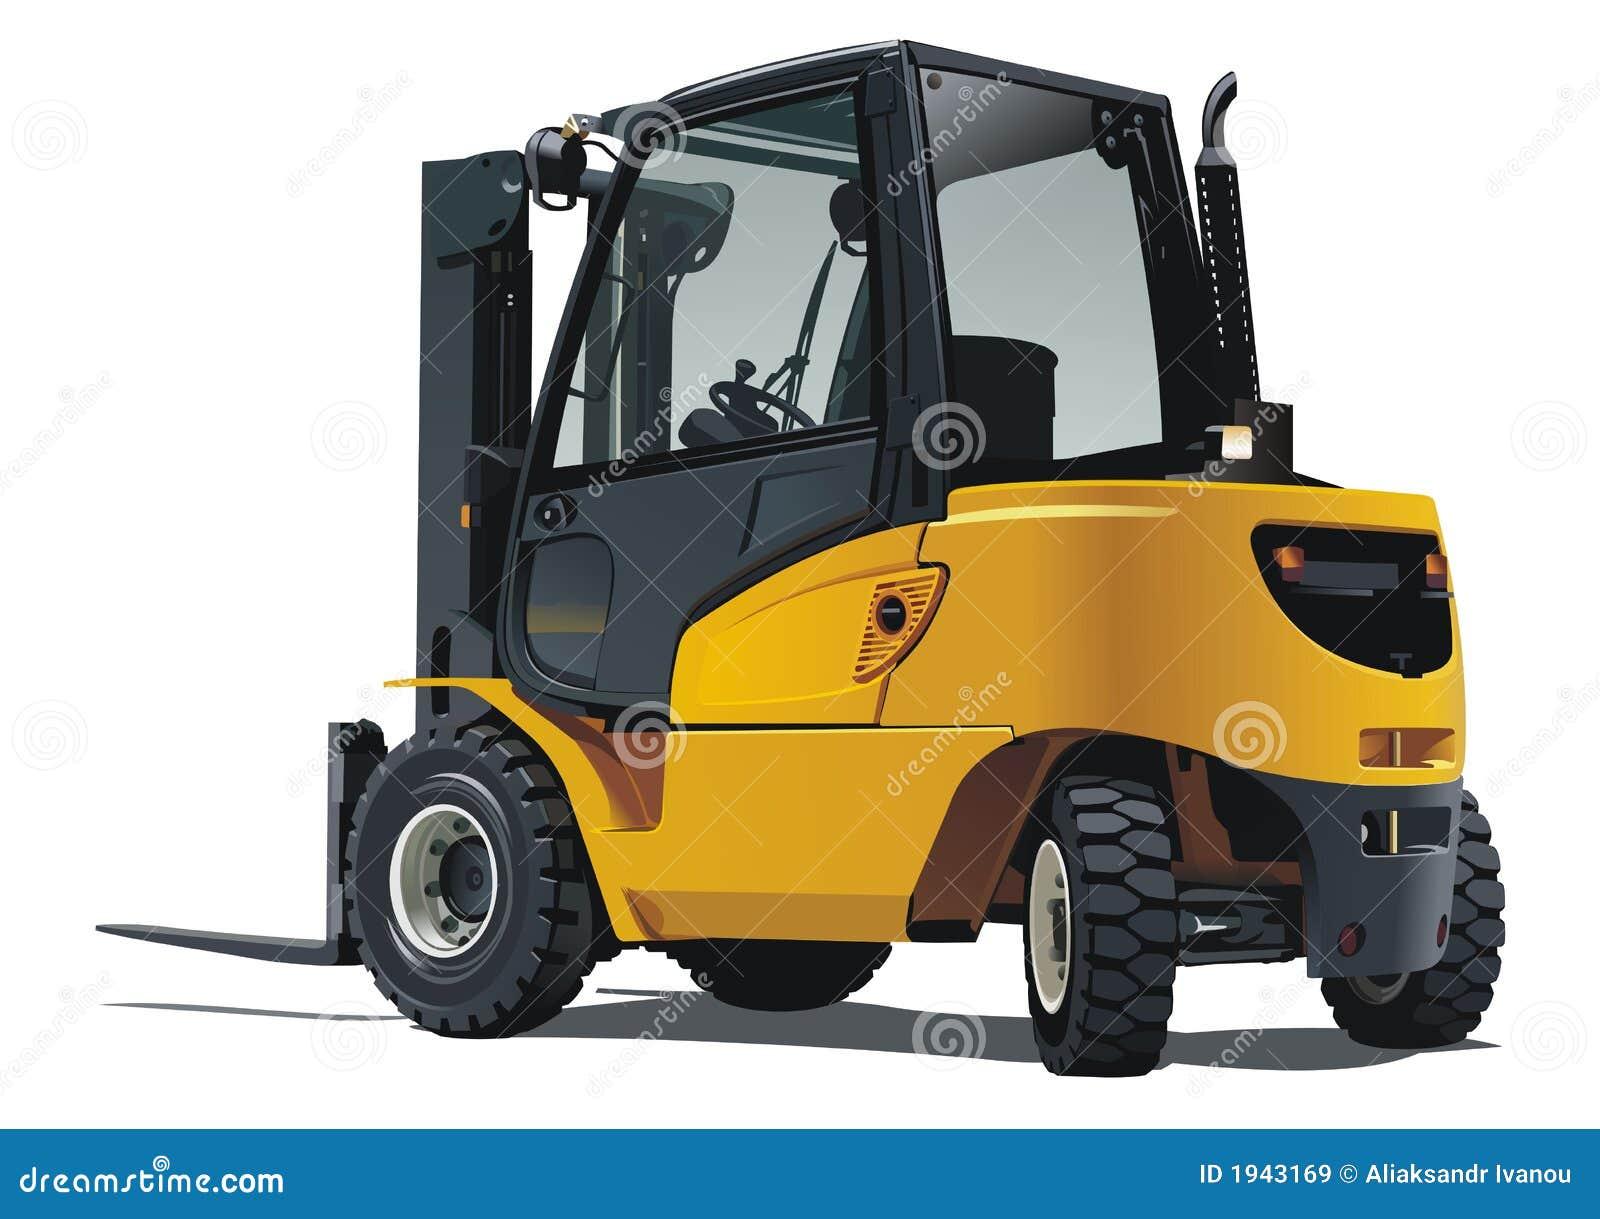 Forklift isolado